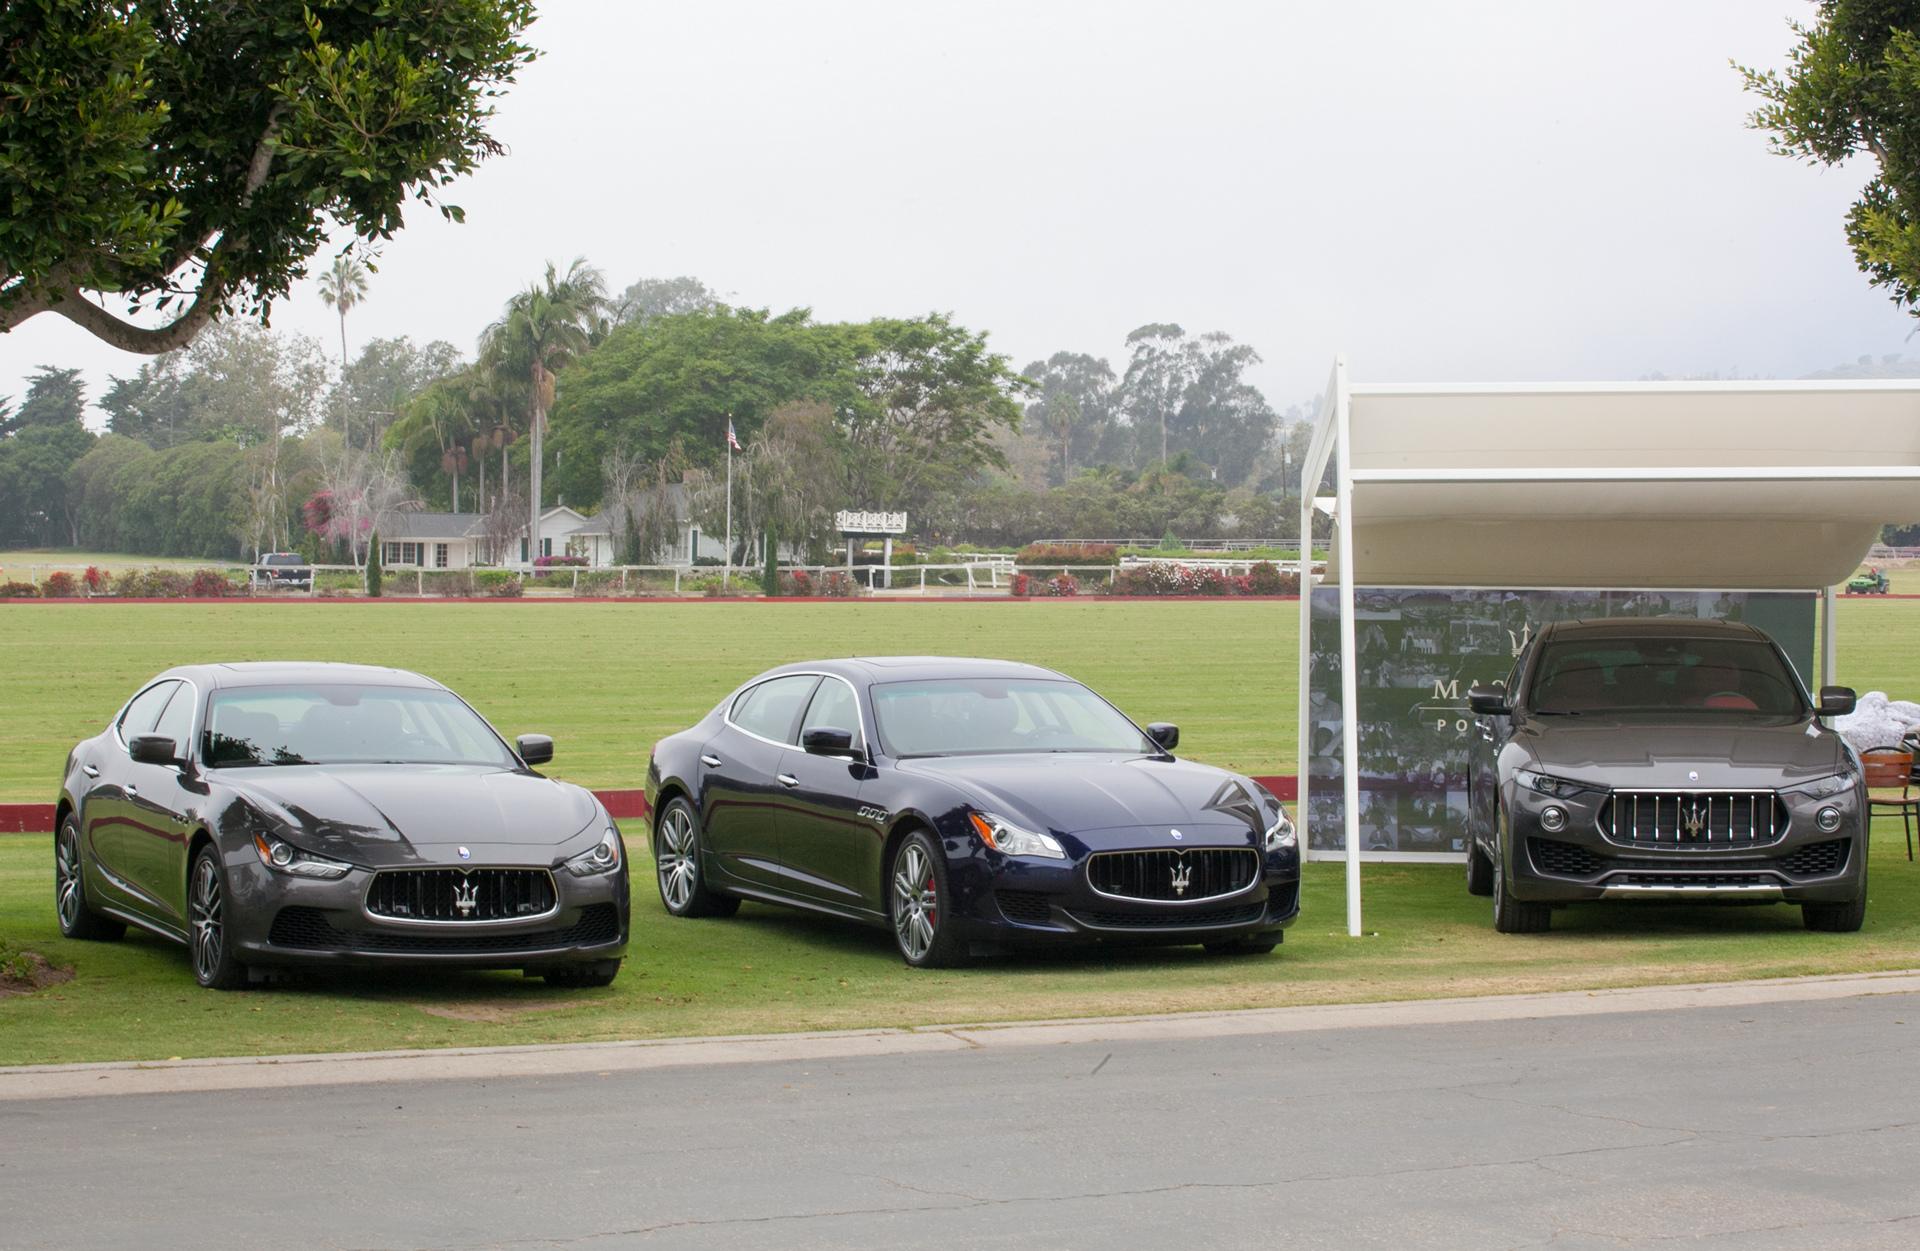 2016 Maserati Silver Cup - Ghibli, Quattroporte, Levante © Fiat Chrysler Automobiles N.V.